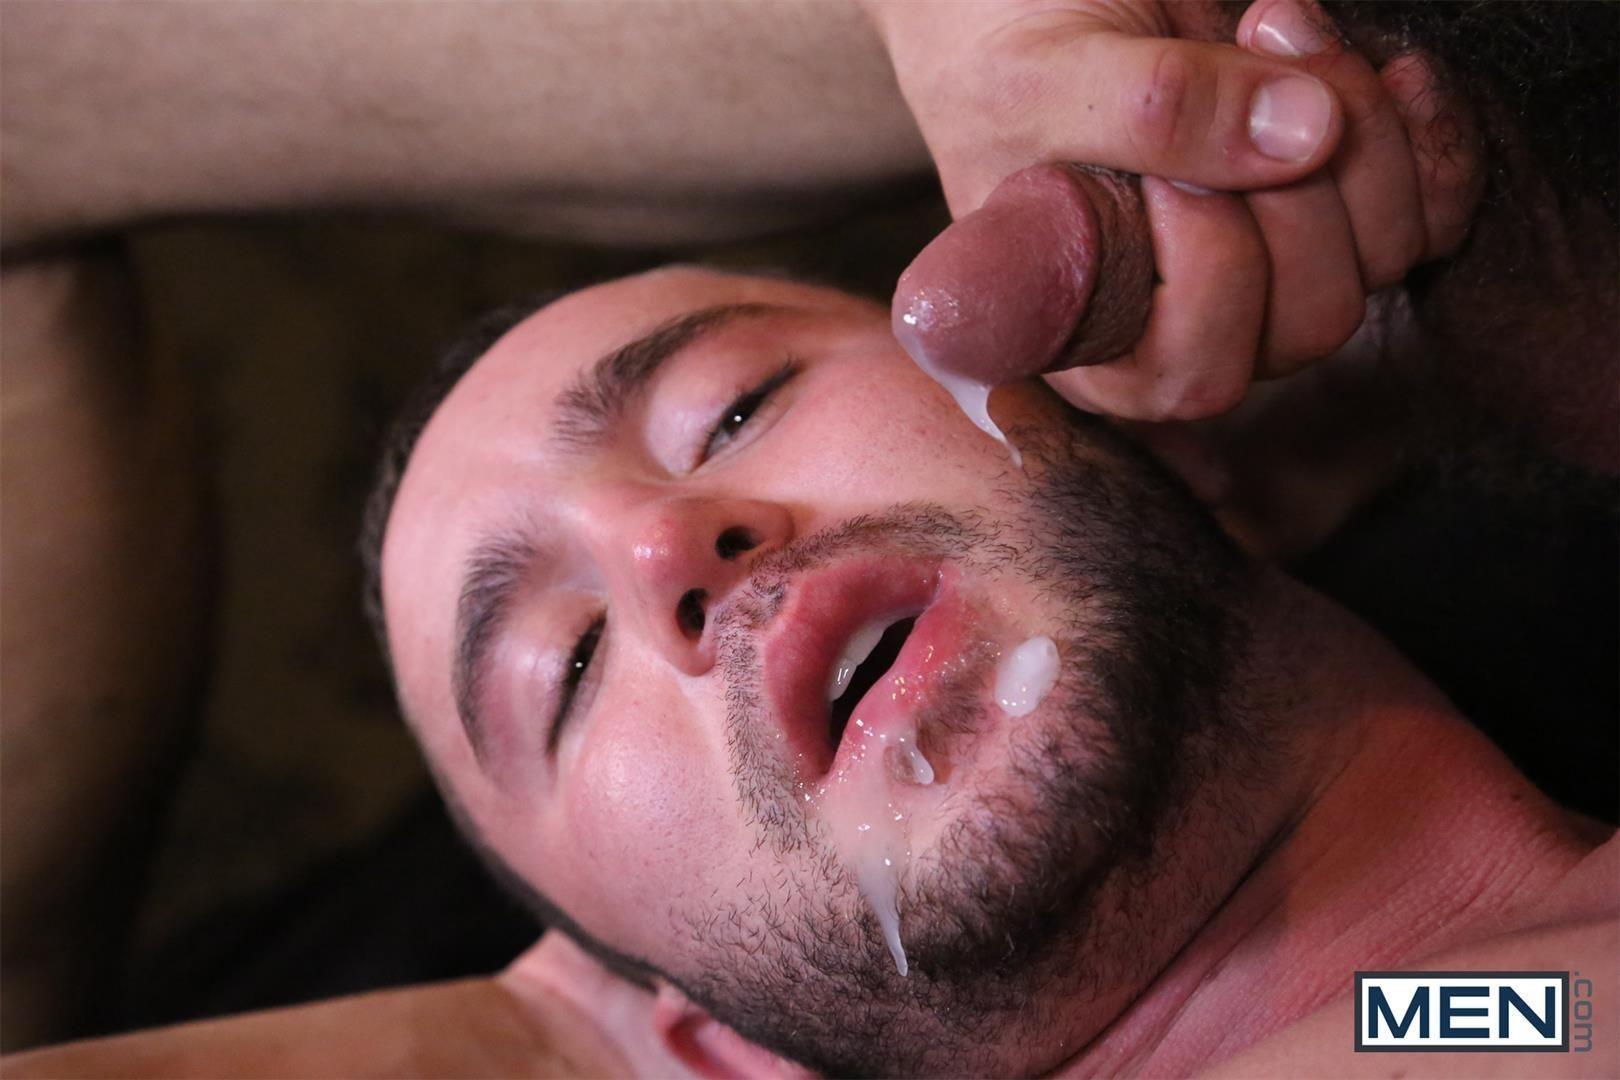 Amateur Sperm Porn spunk eating men . hot porno.